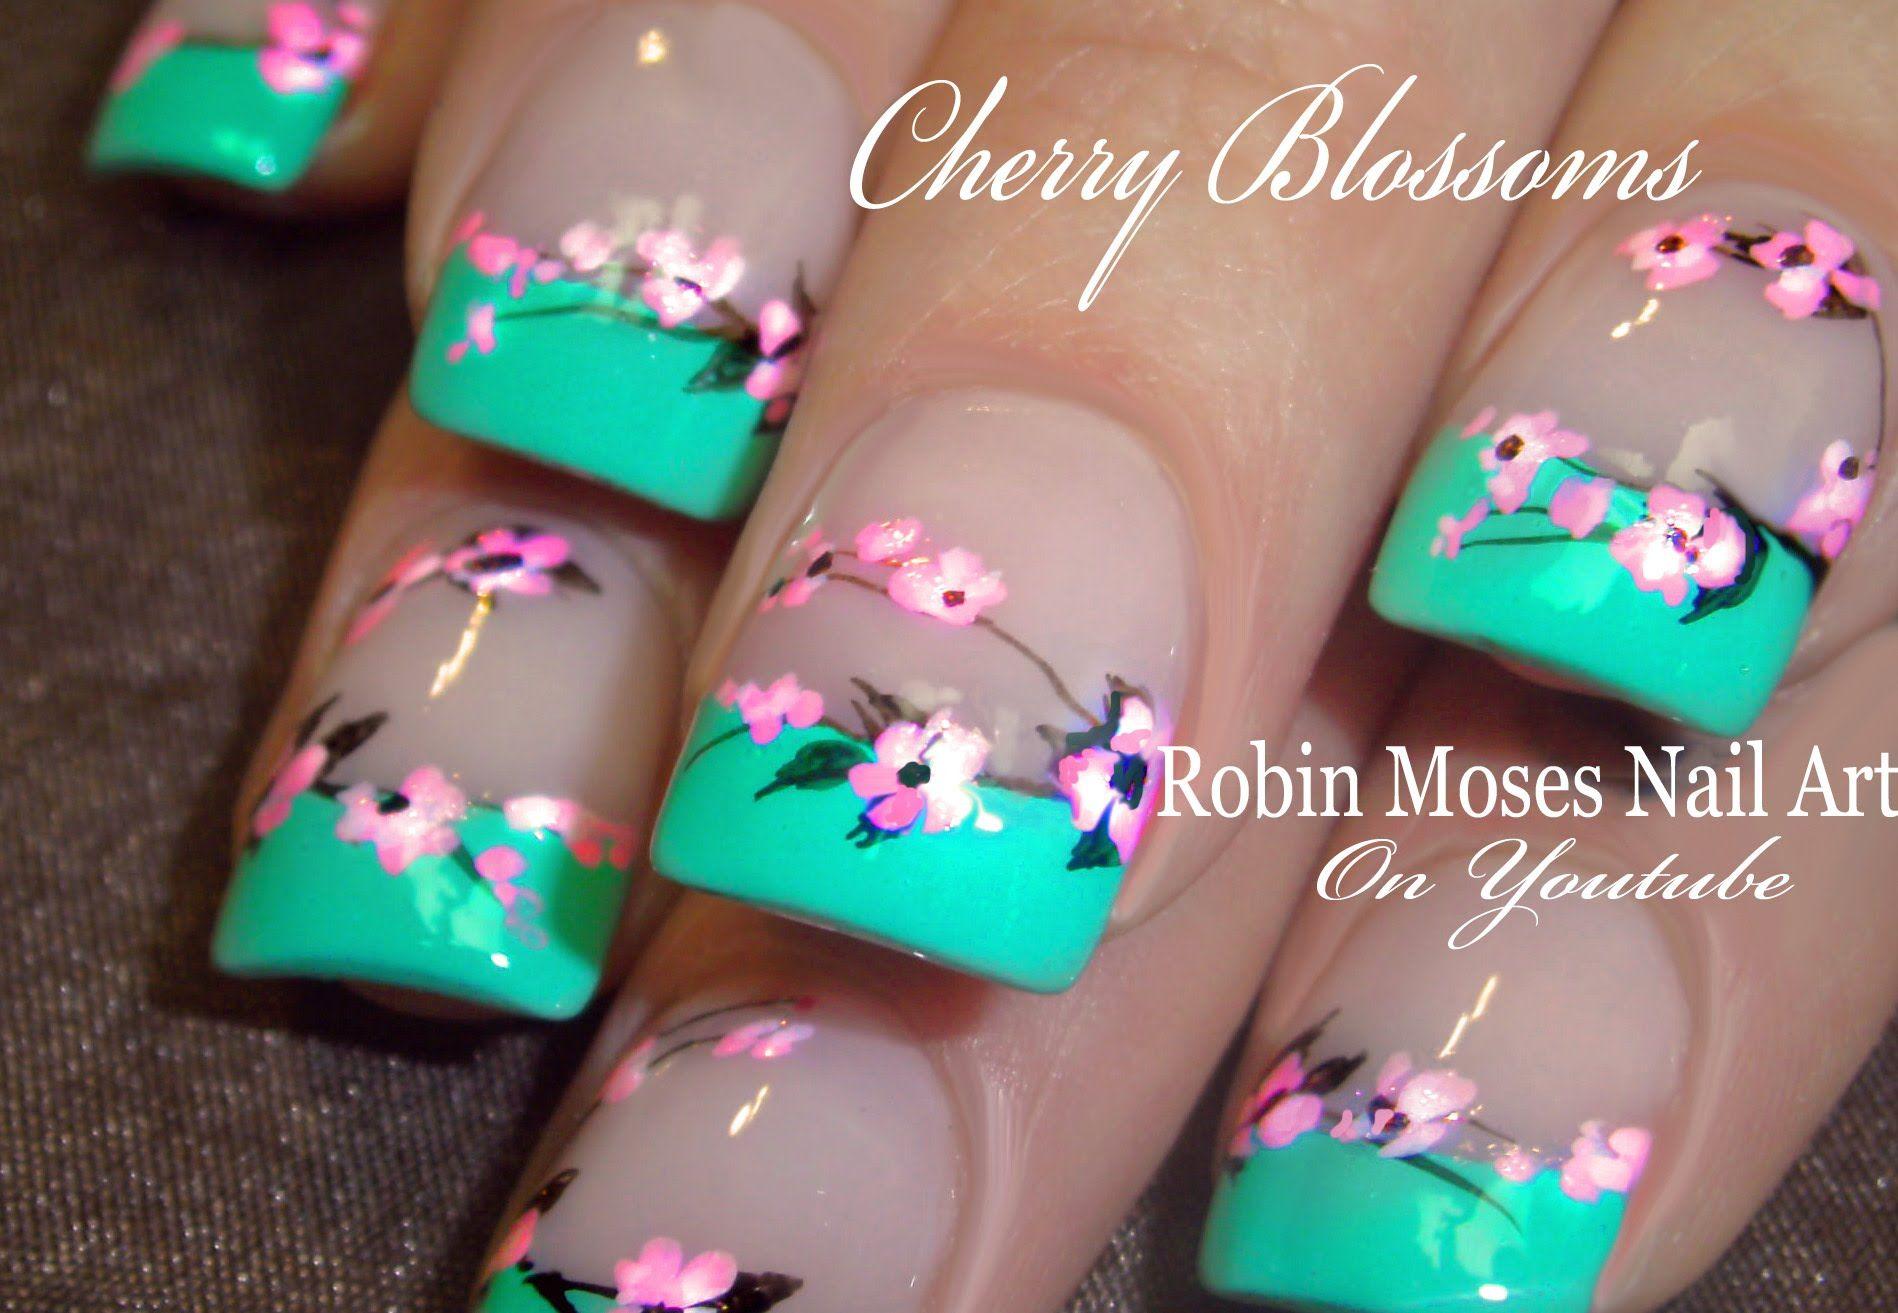 Cherry Blossom Nail Art Nailart Nails Naildesign Design Tutorial Cherryblossom Flowernails Flowers Diynails Easynailart Diynaiart